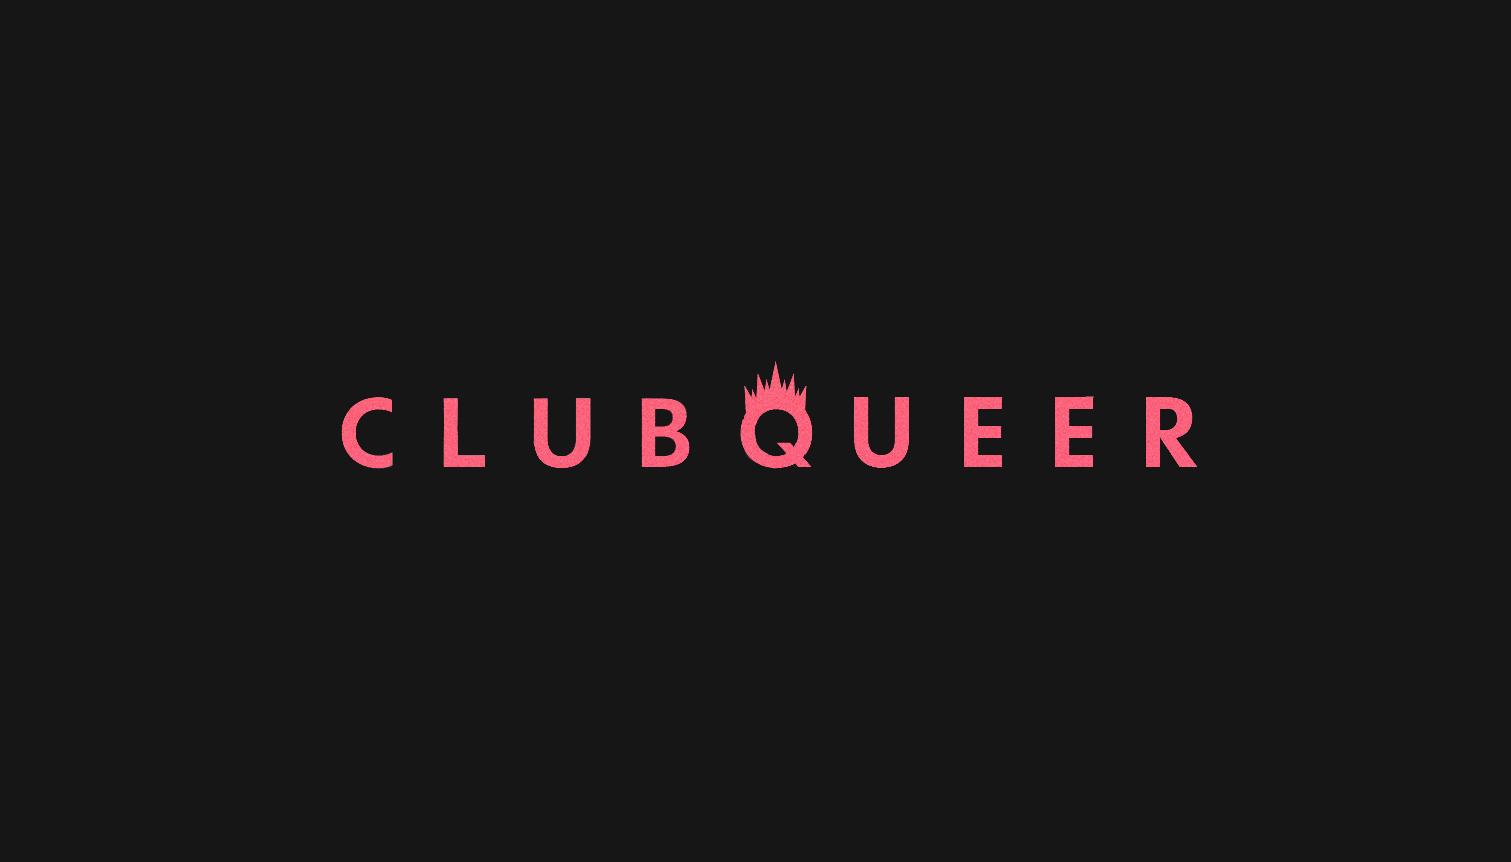 CLUB QUEER